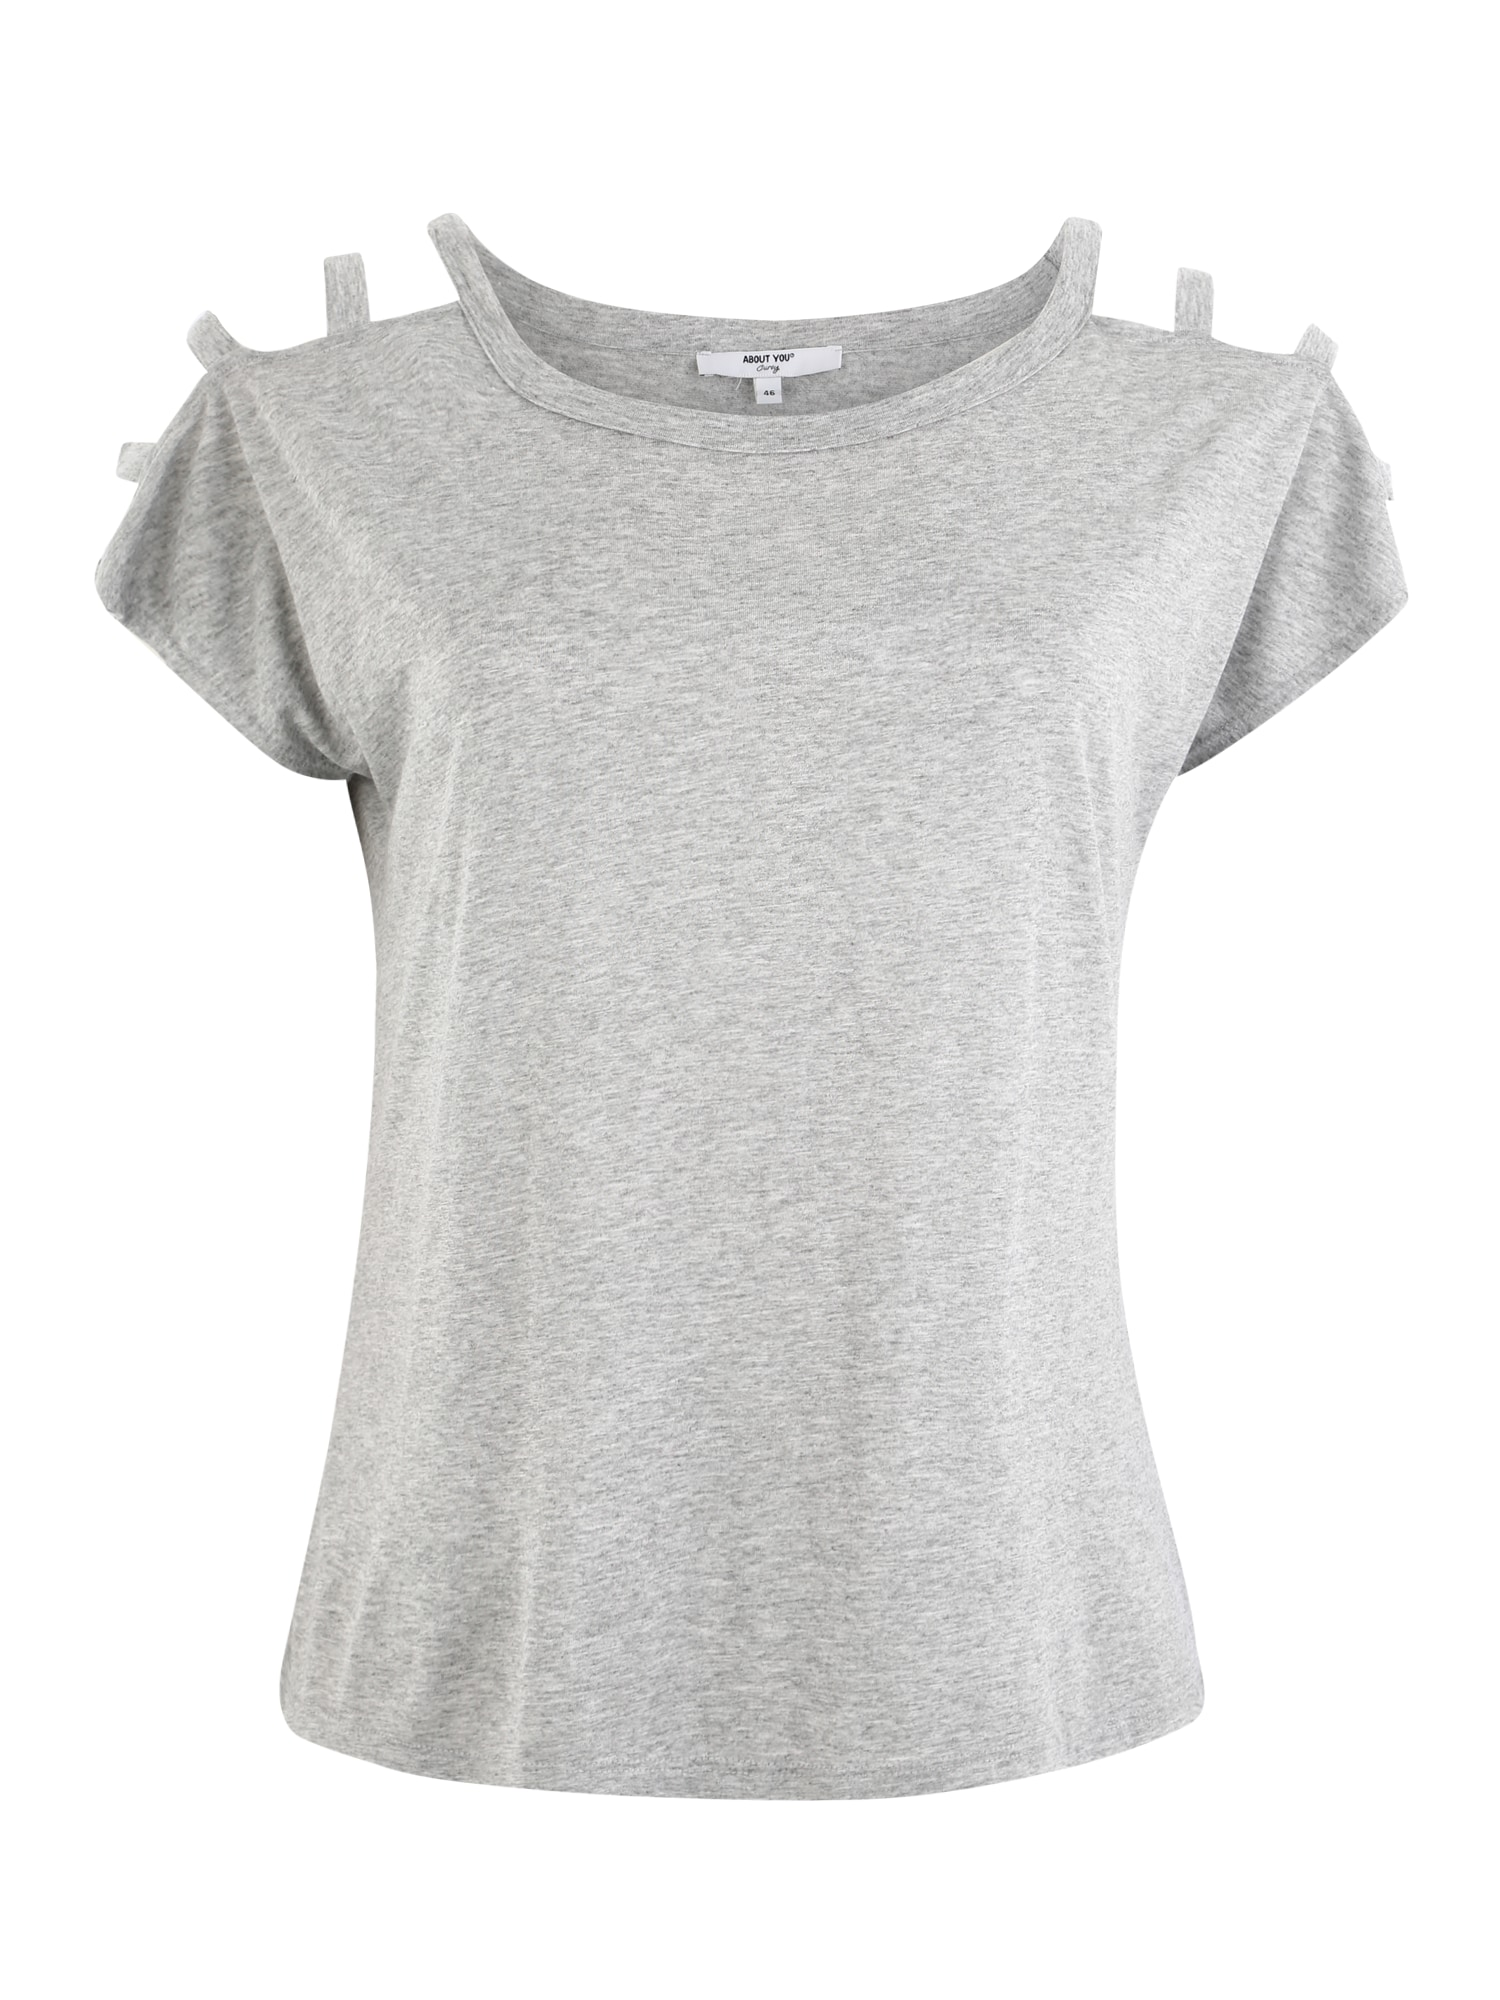 ABOUT YOU Curvy Marškinėliai 'Loryn' margai pilka